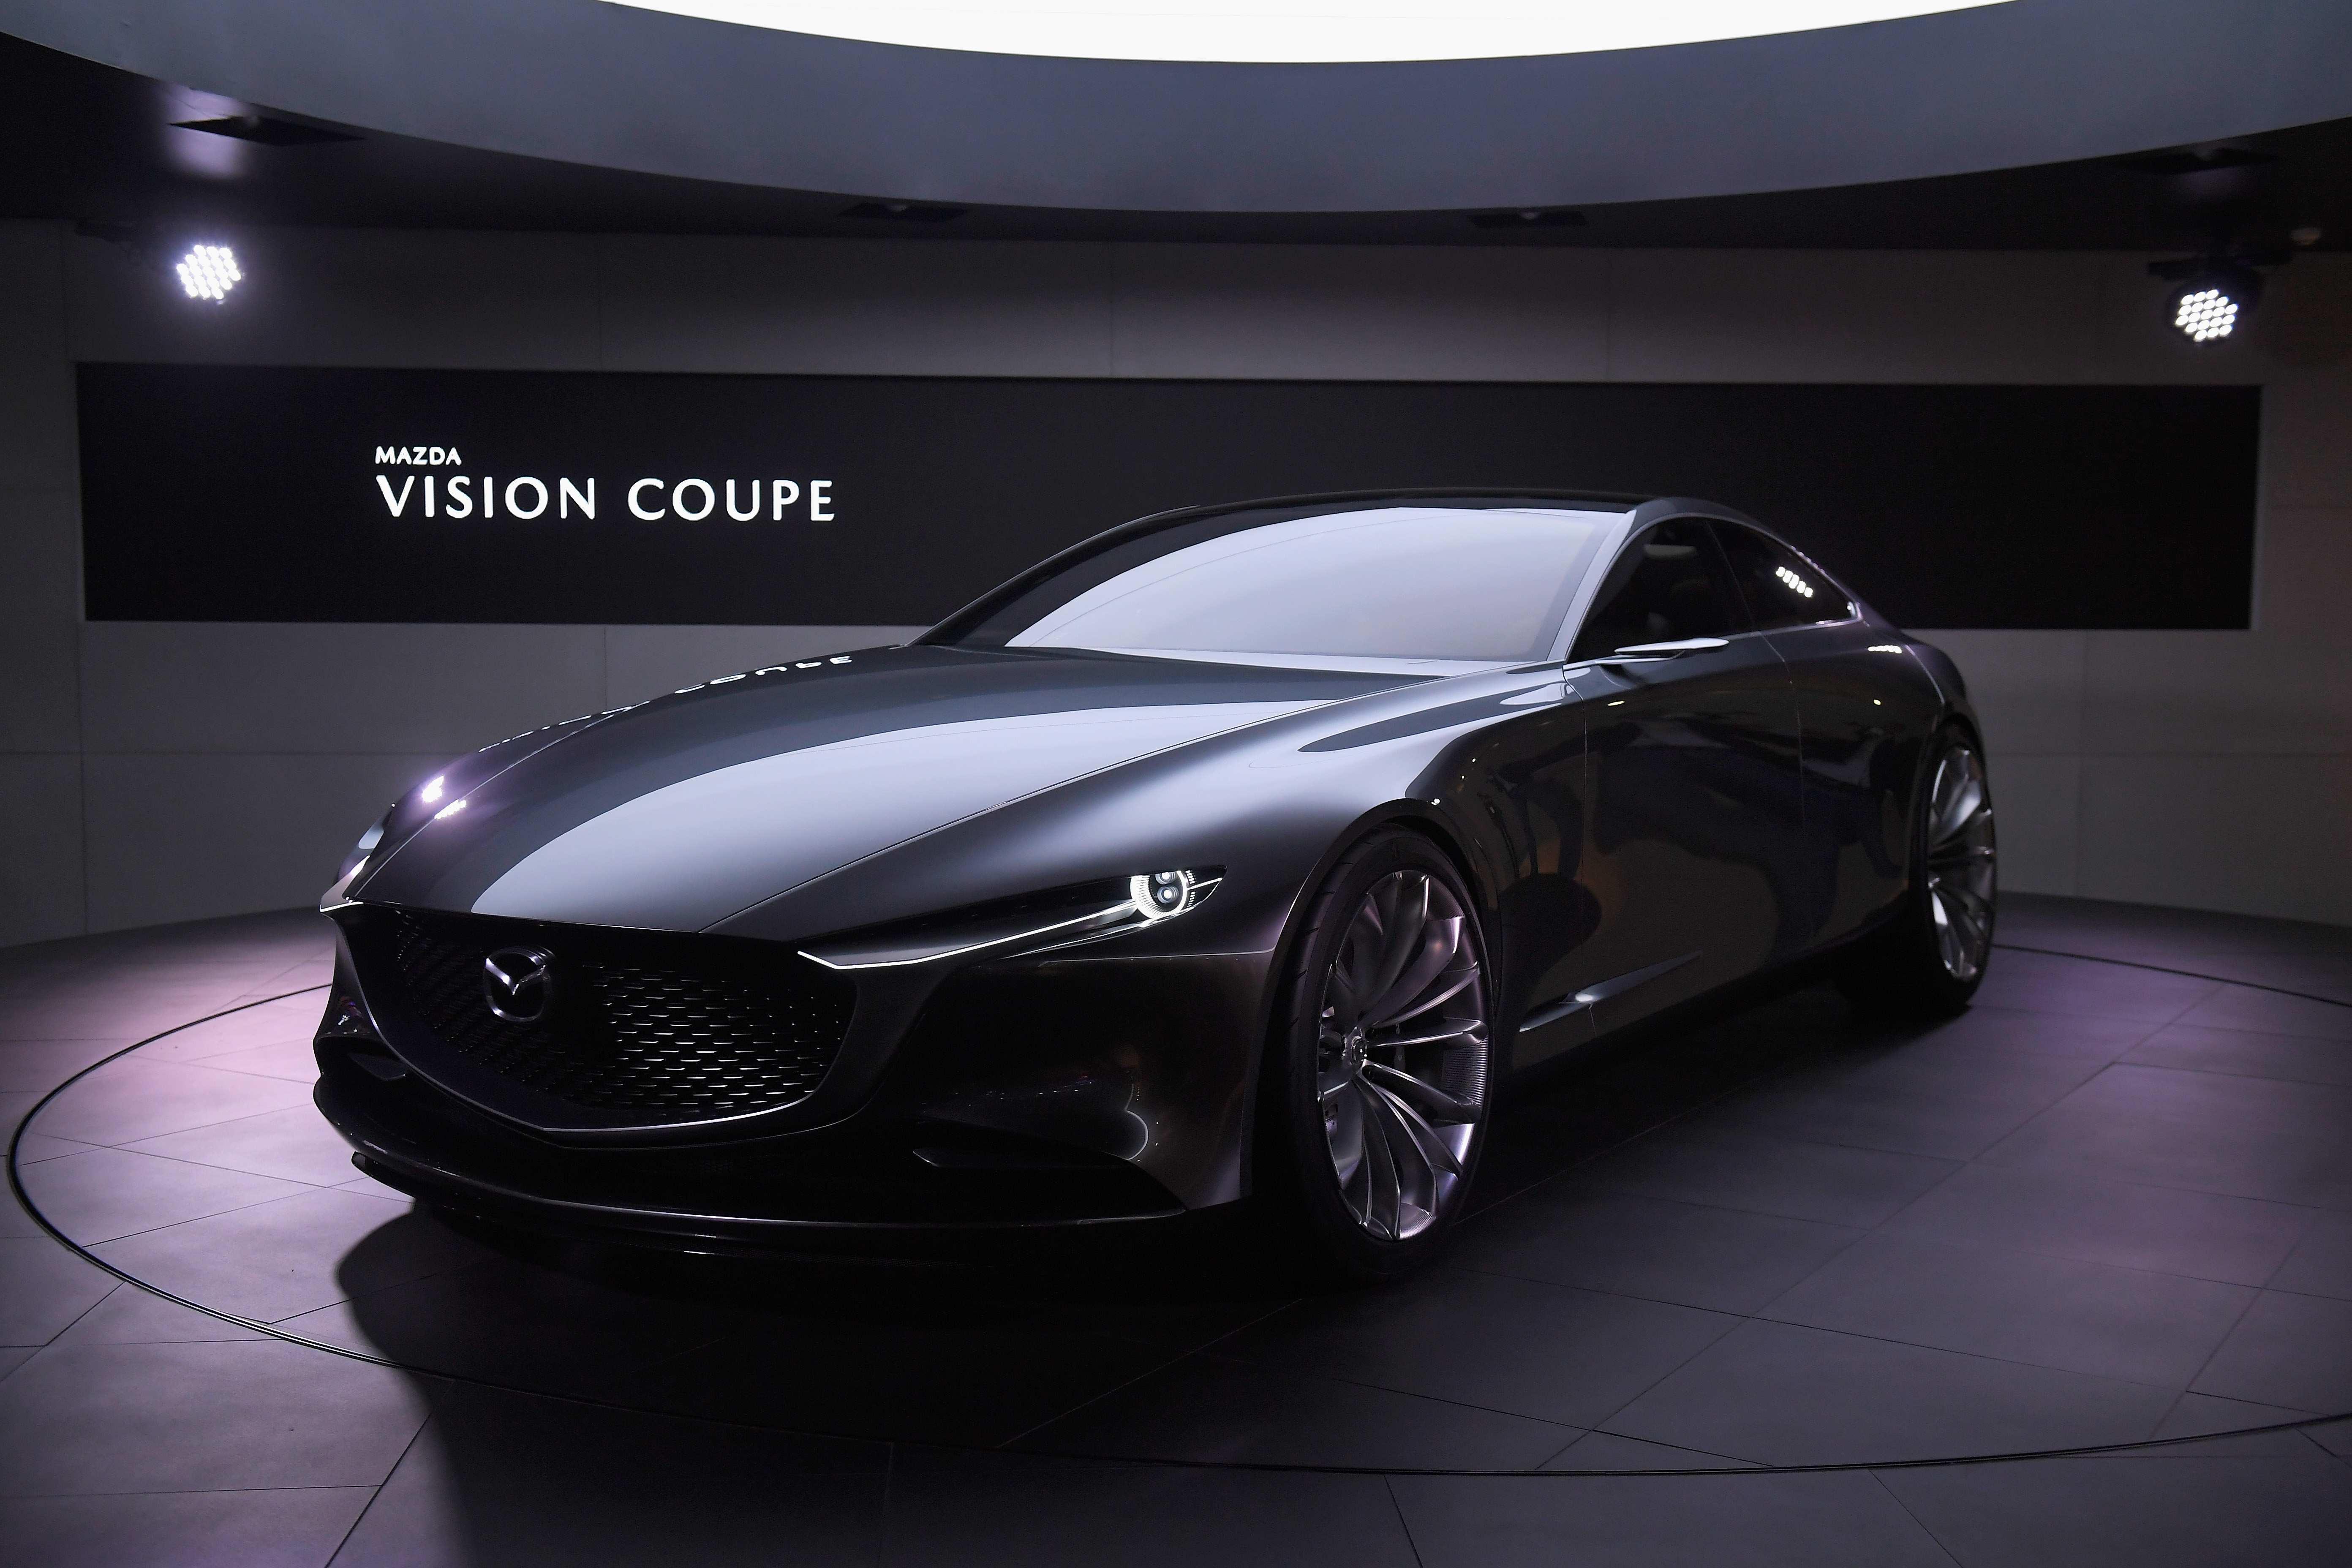 55 New Lamborghini 2020 Prototype Pictures by Lamborghini 2020 Prototype